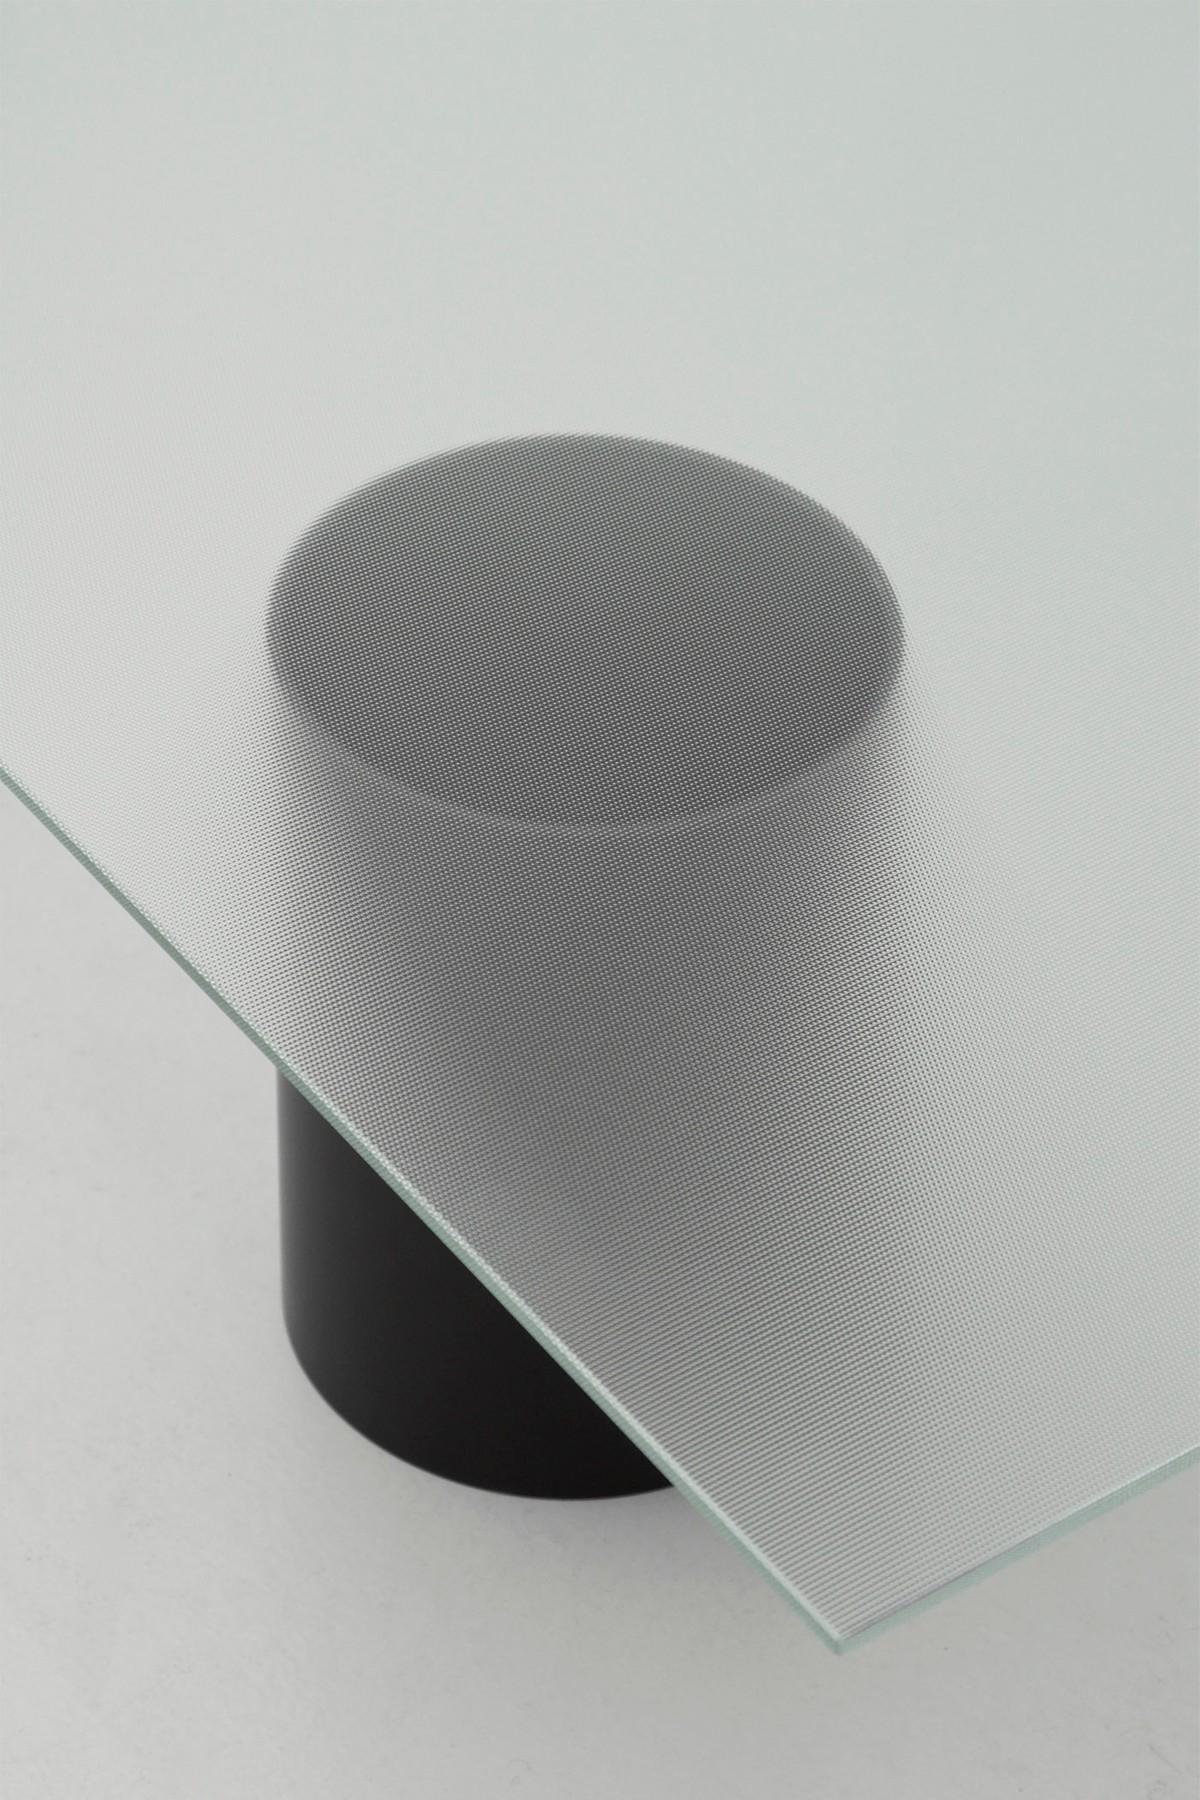 OS-OOS-minimalissimo-3.jpg